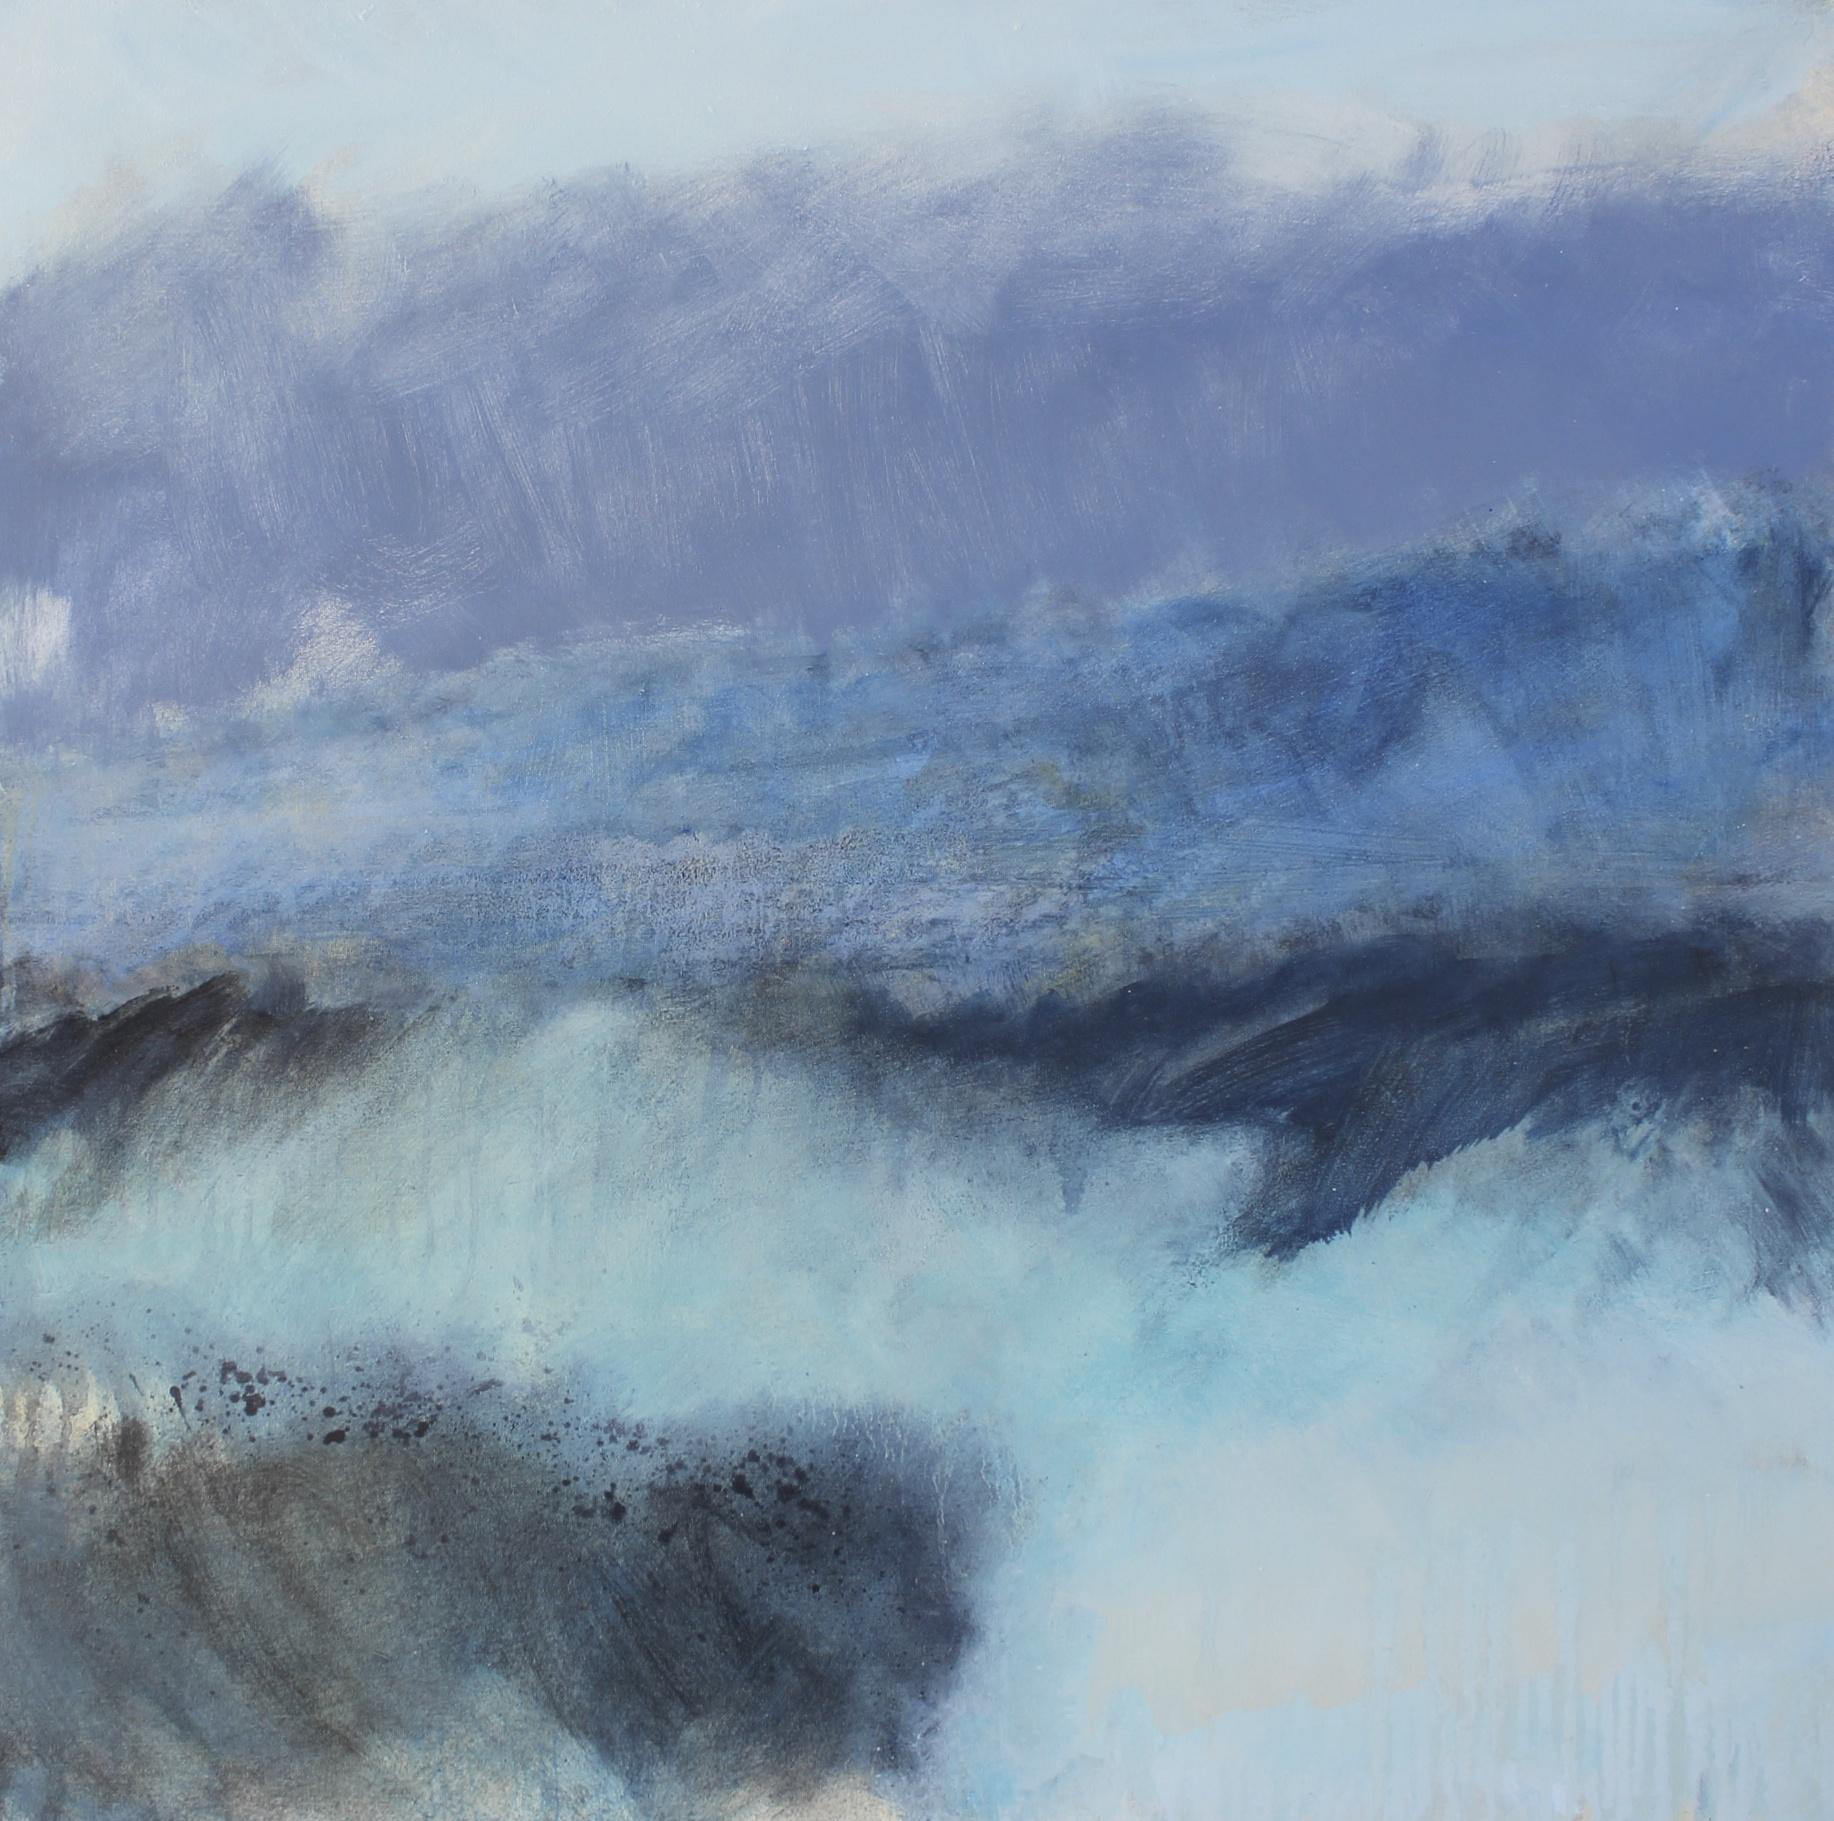 Leah-Beggs-2014-Oin-on-canvas-72-x-72-cm-BLUE-ROCK.jpg